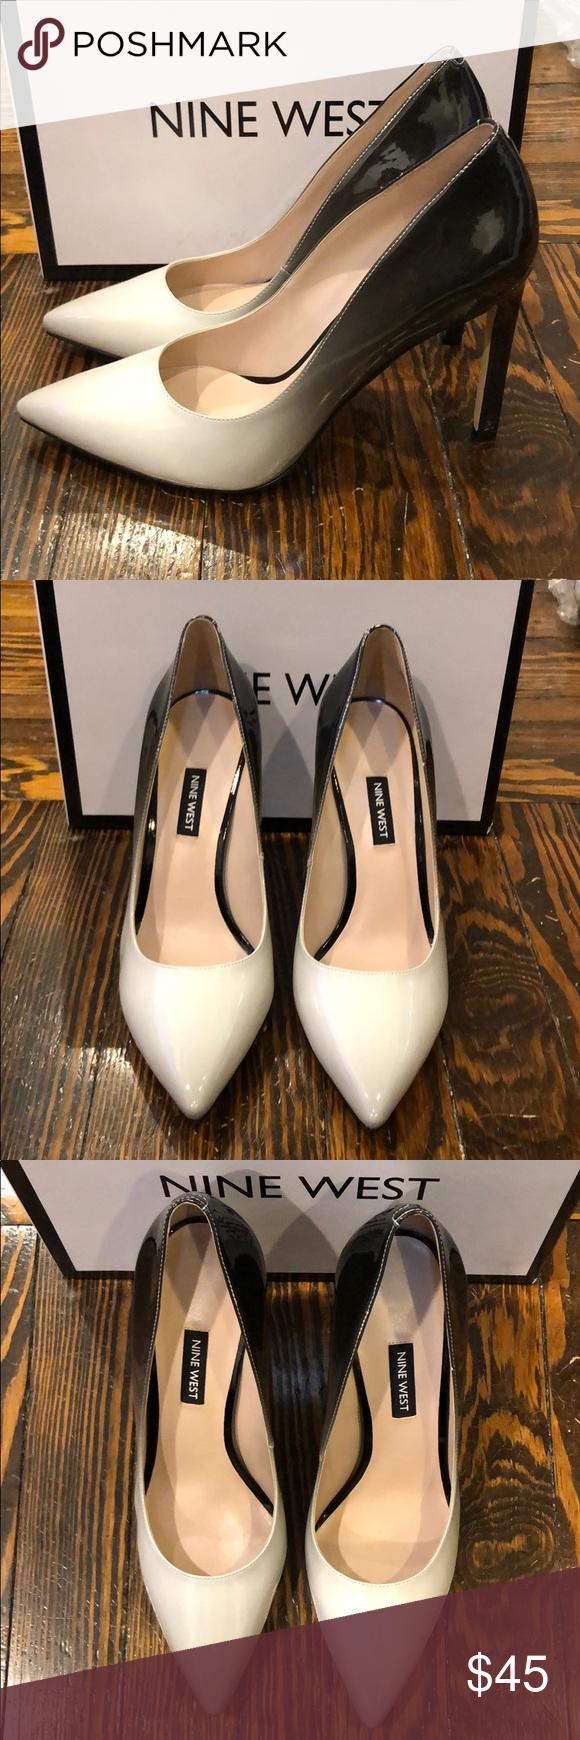 Shoes Heels | Pumps, Heels